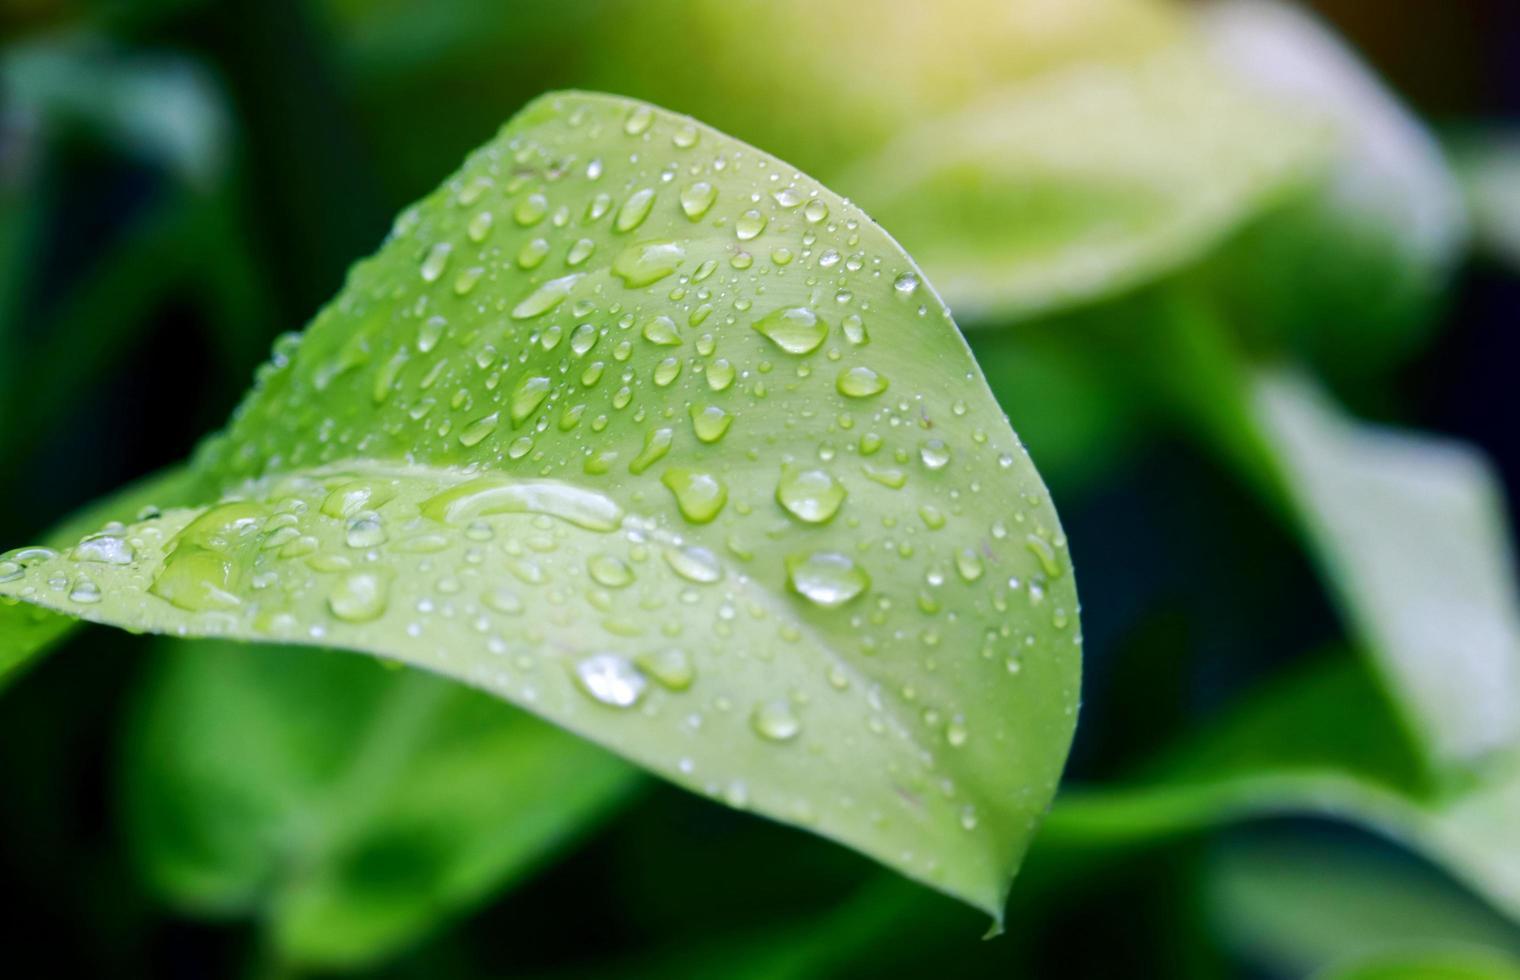 goccioline d'acqua su foglie verdi foto